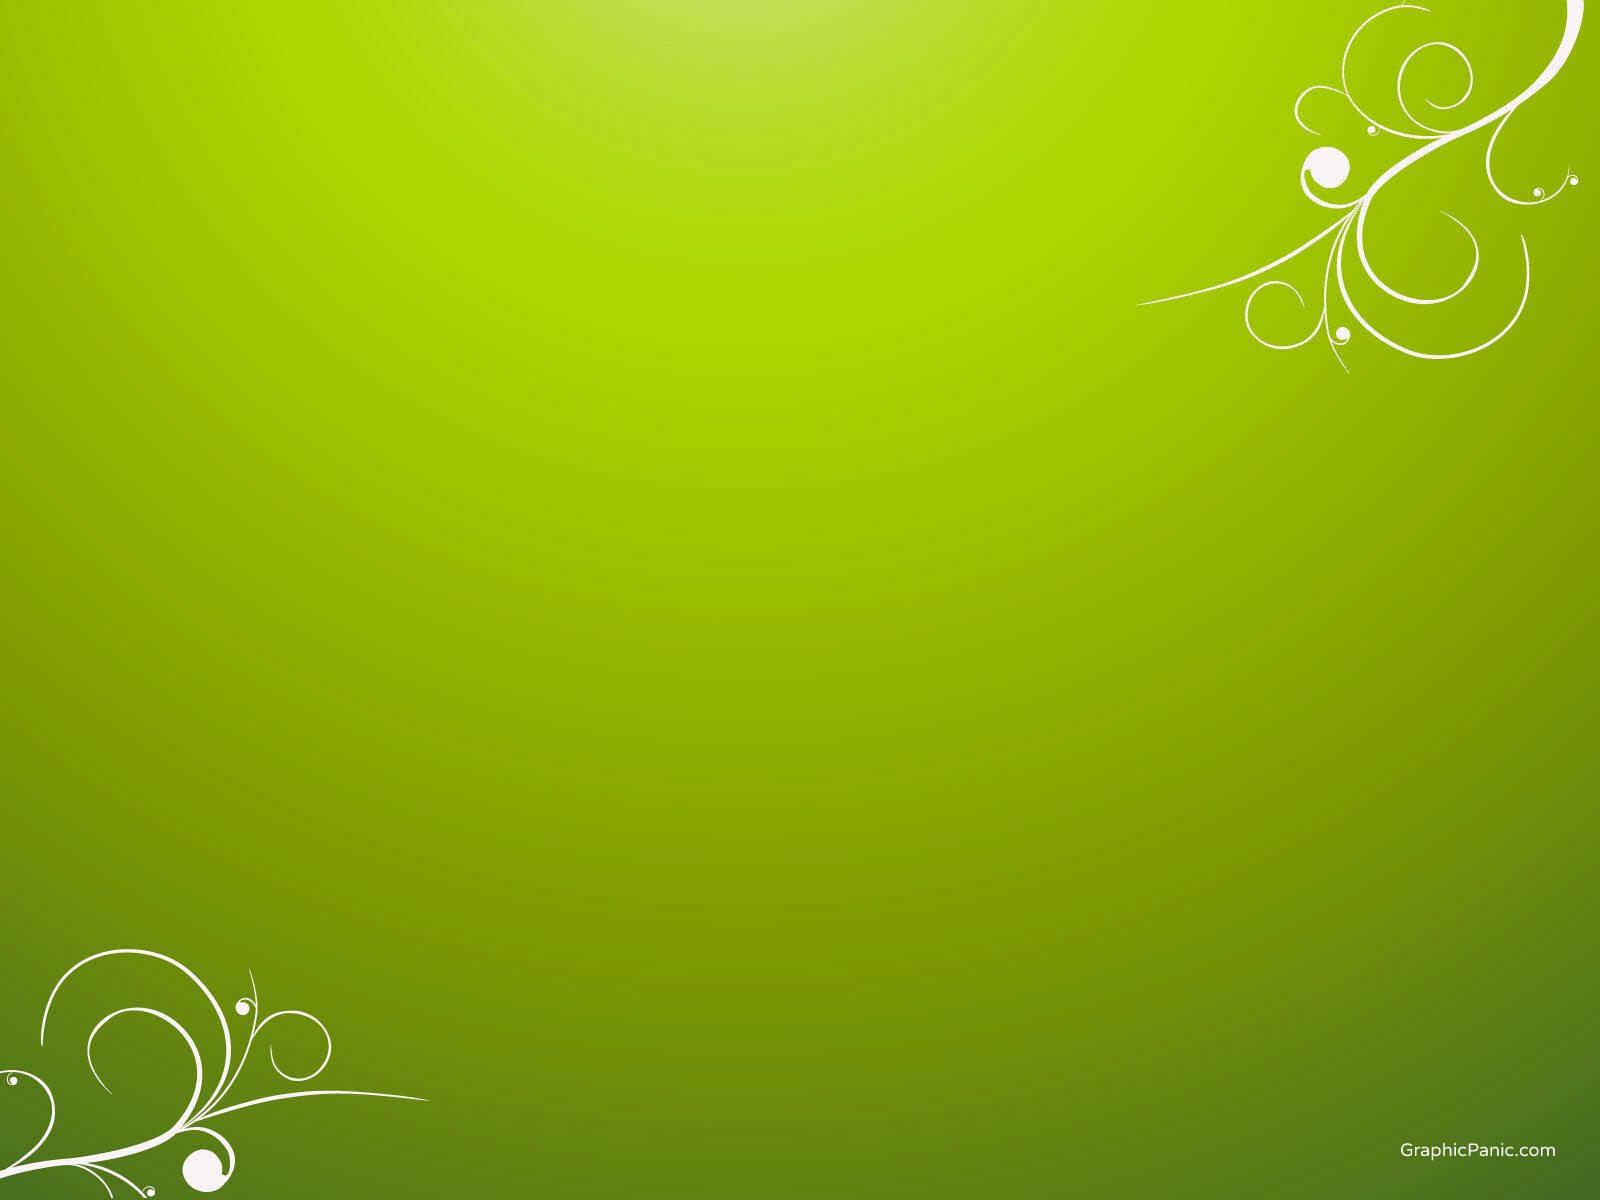 Flower Powerpoint Template   Powerpoint Background And For Microsoft Office Powerpoint Background Templates